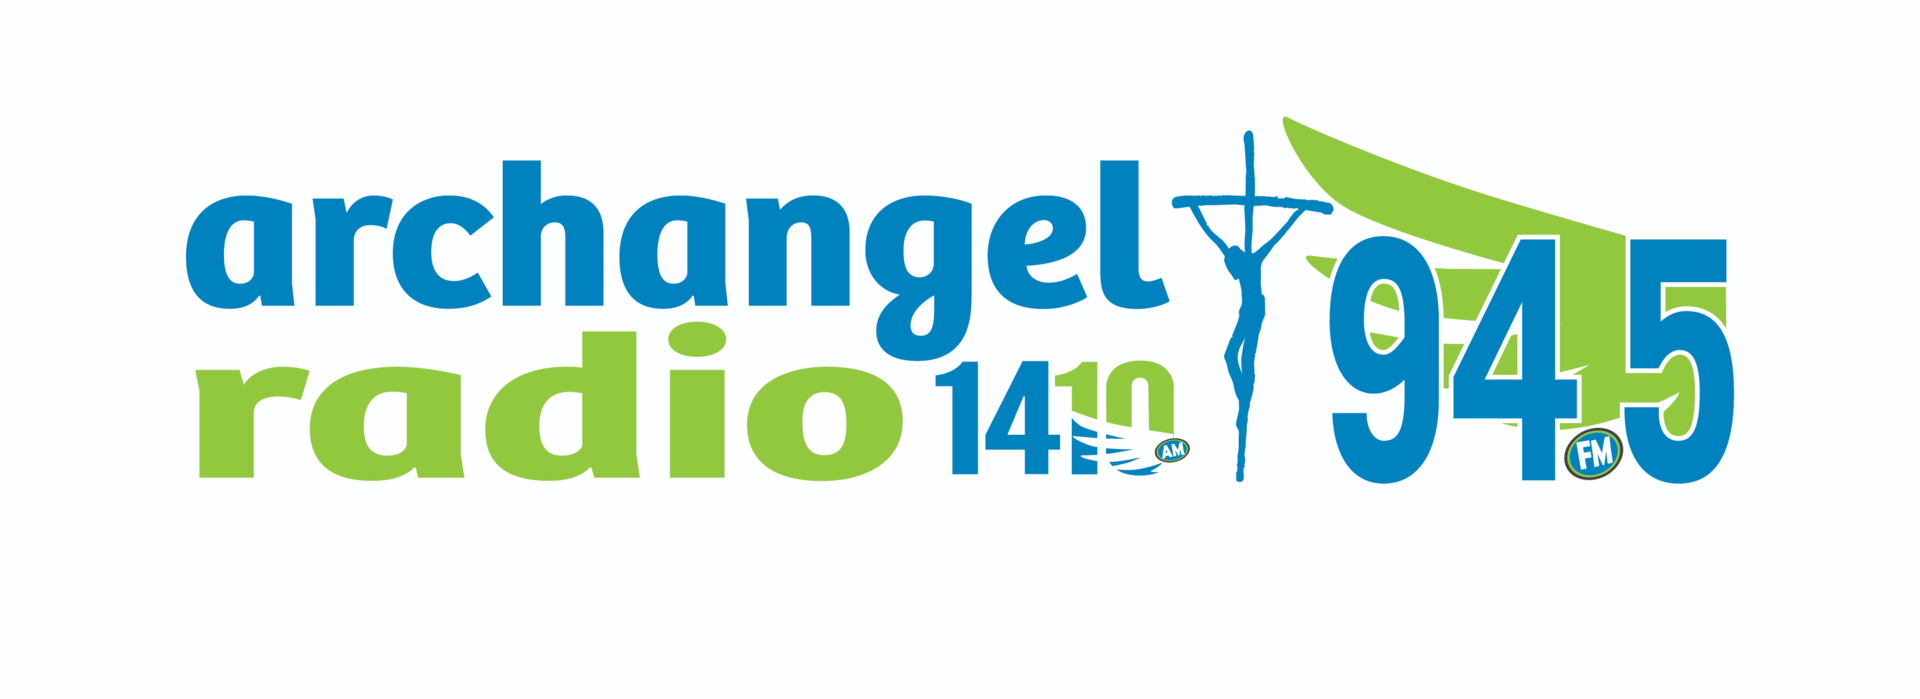 archangel radio